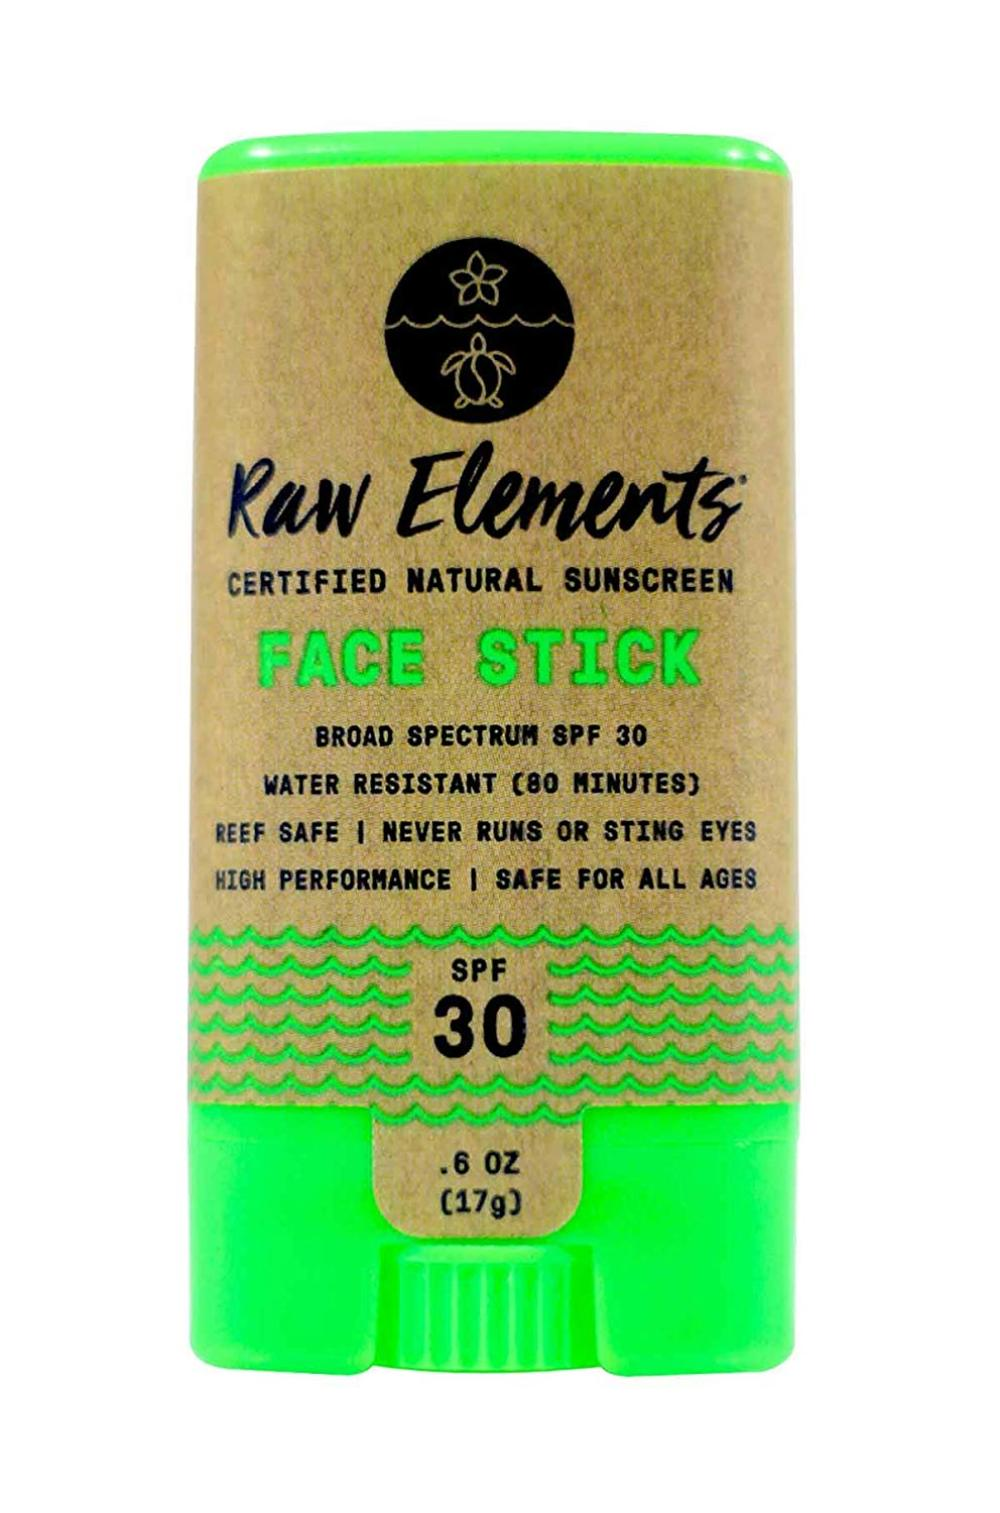 Face Stick Certified Natural Sunscreen   Non Nano Zinc ...